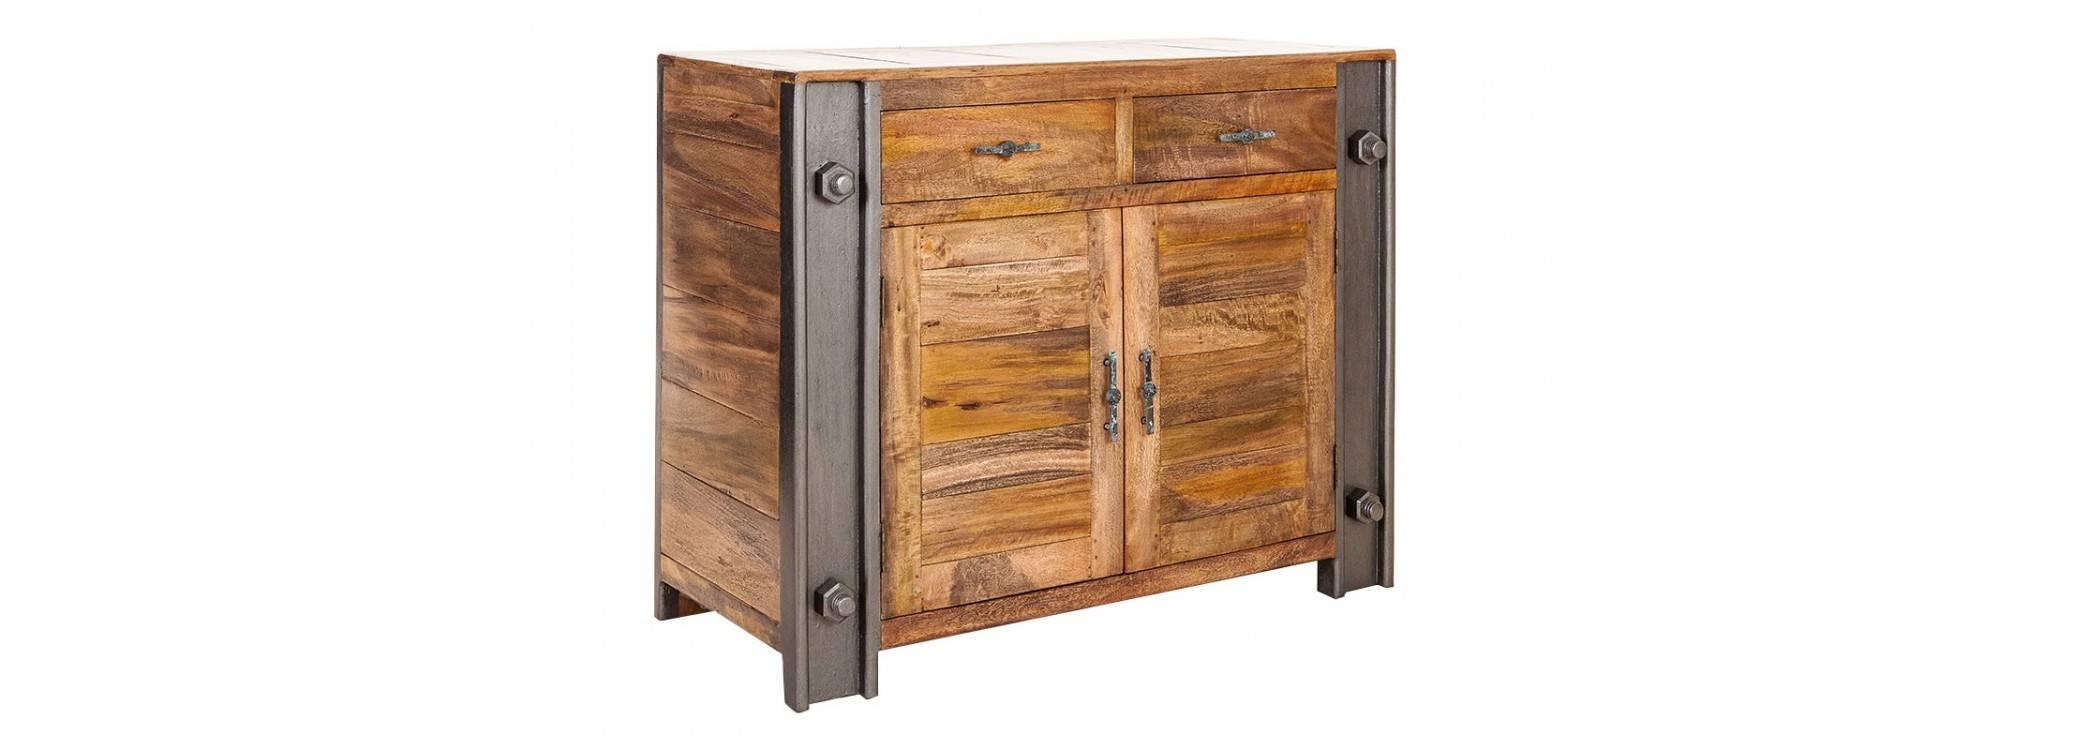 Sideboard industrial Profile - 2 doors and 2 drawers